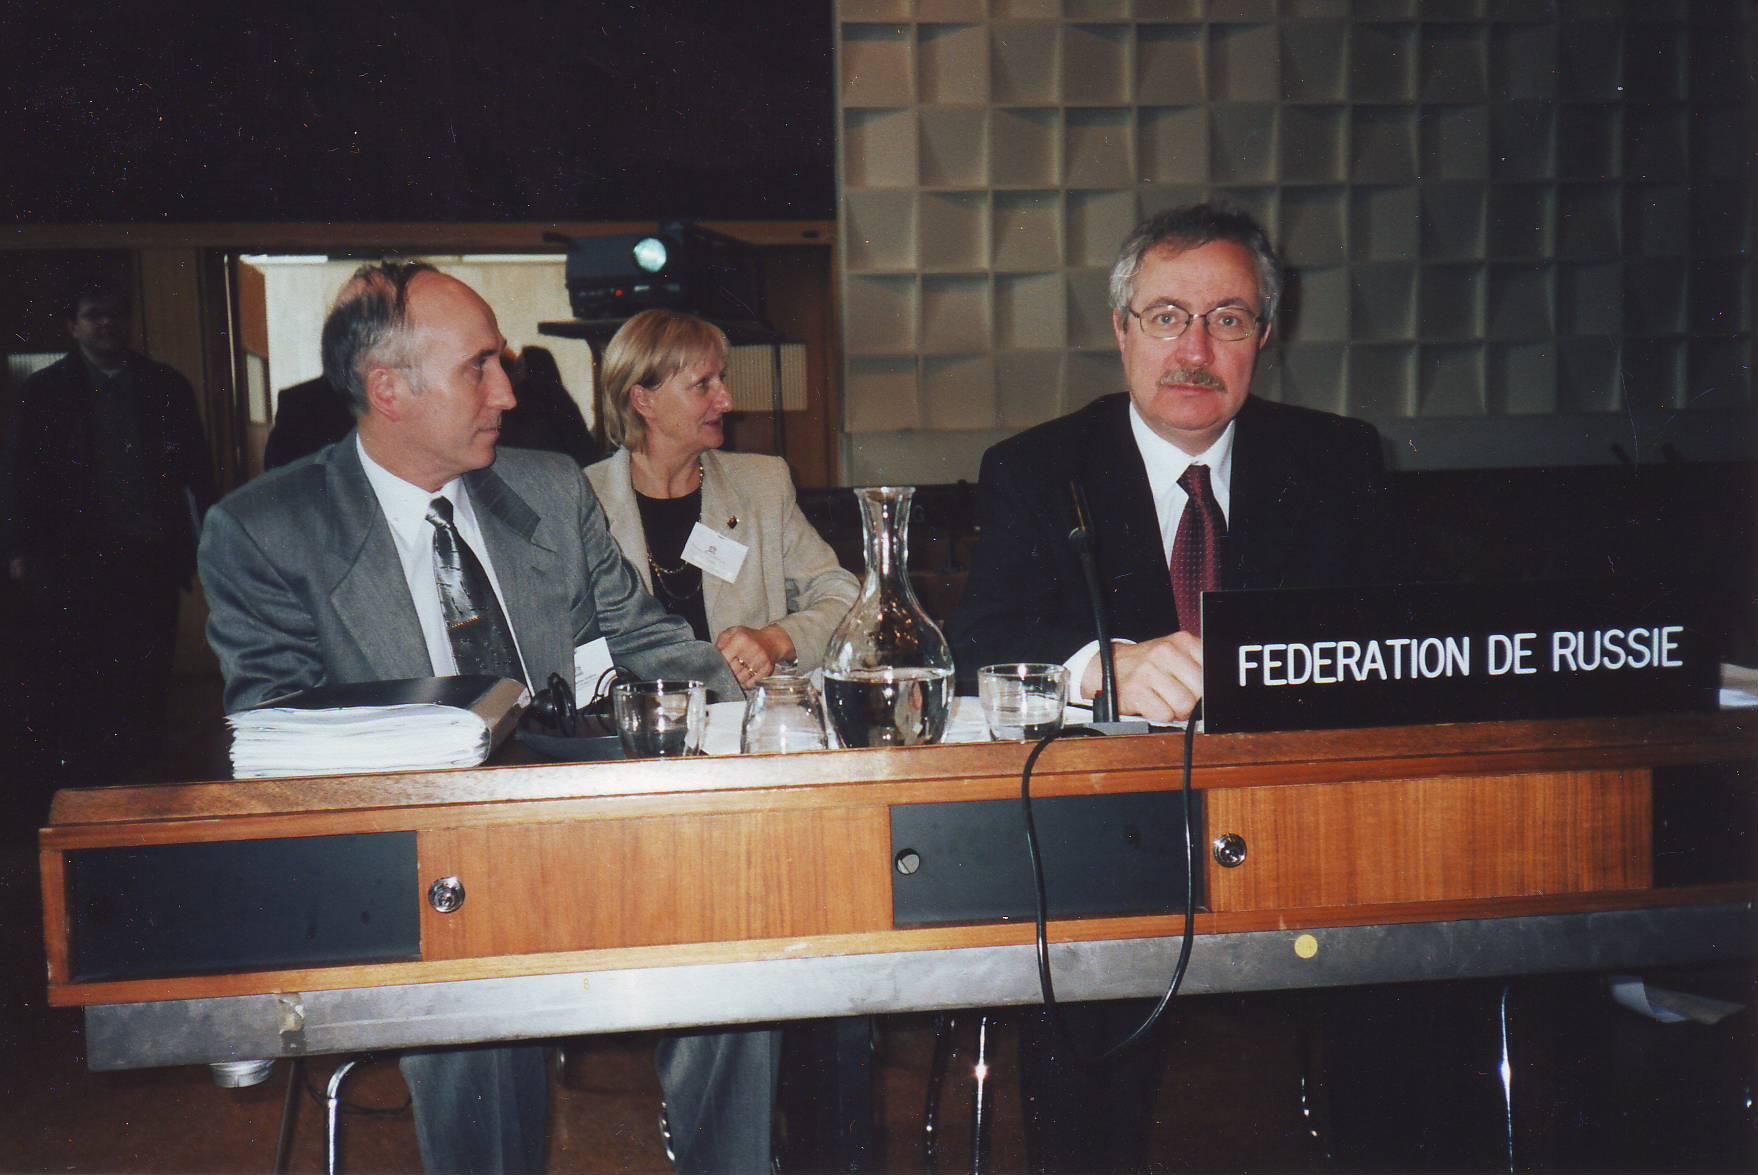 презентации по россии 1992 2000 гг